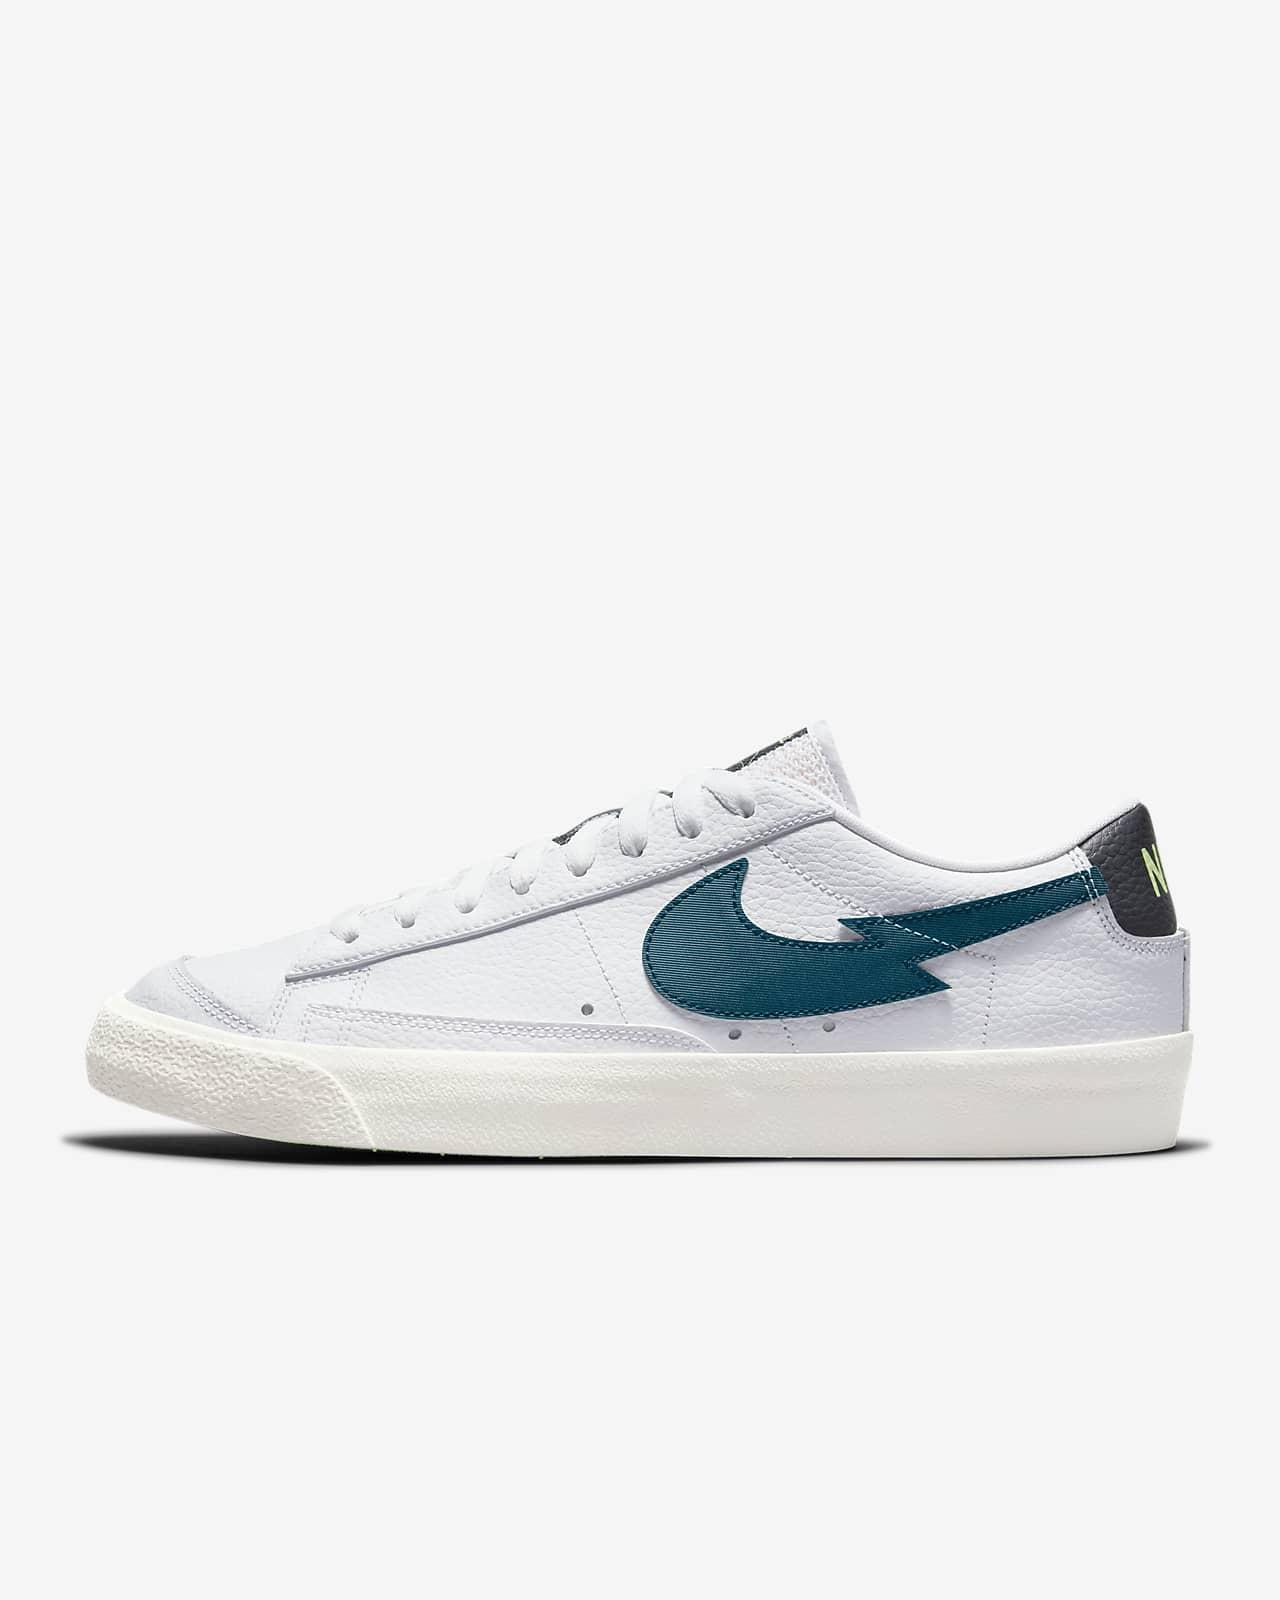 Chaussure Nike Blazer Low '77